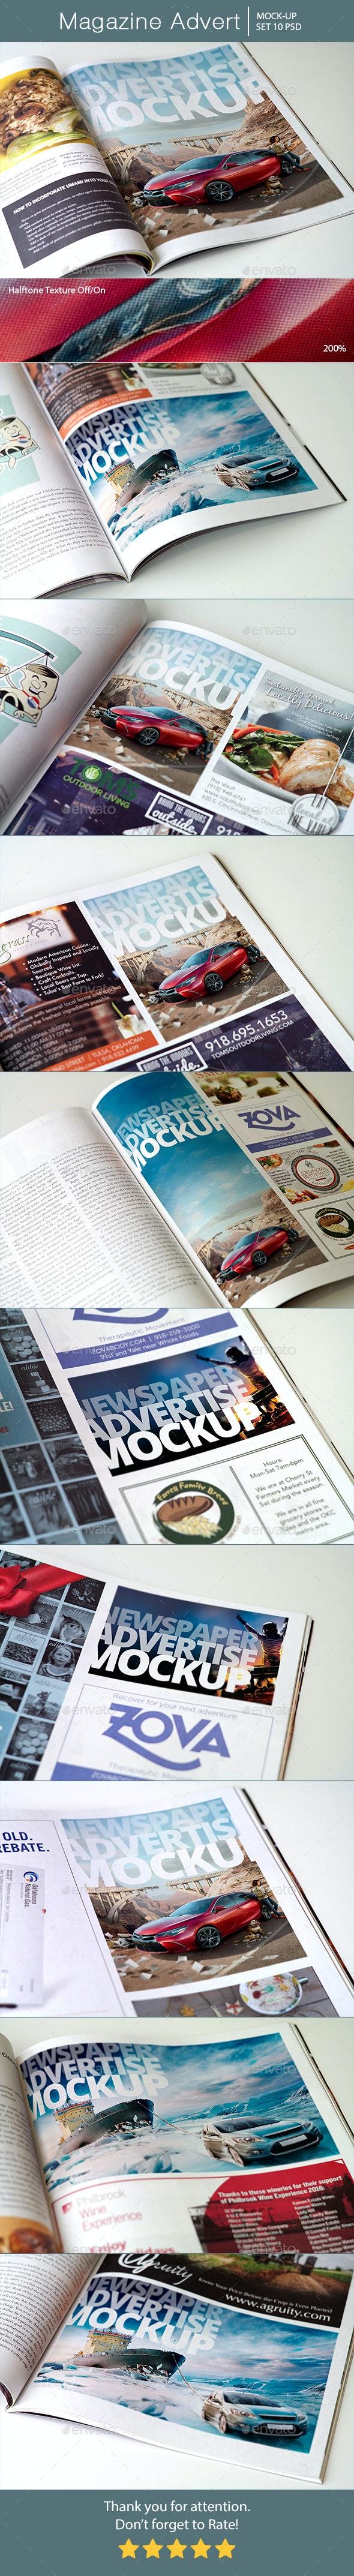 Magazine Advert Mockups - Miscellaneous Print